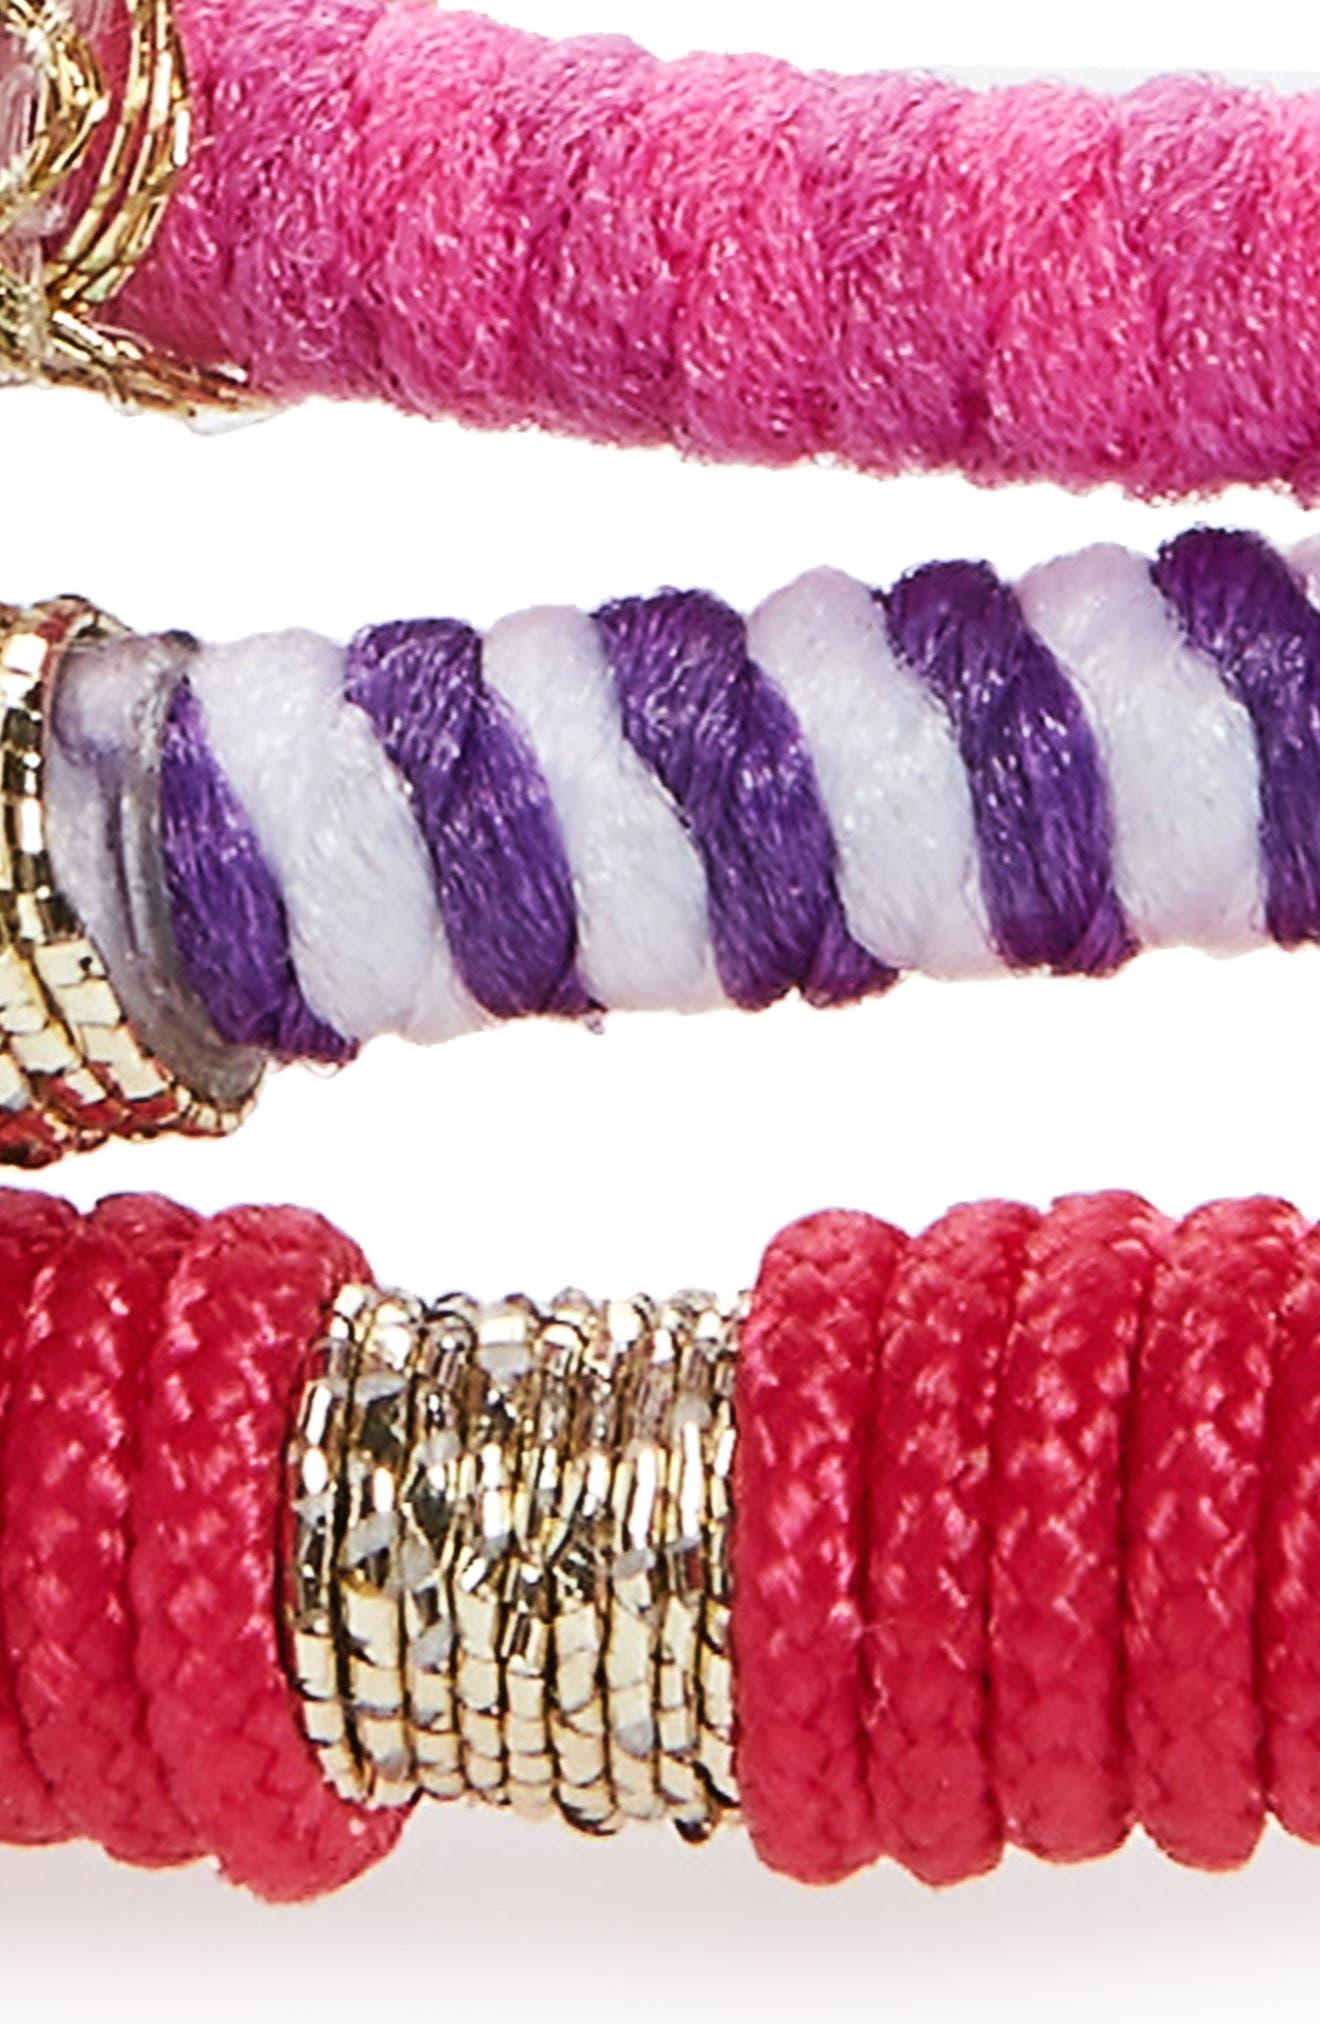 Moroccan Set of 3 Ponytail Holders,                             Alternate thumbnail 3, color,                             Pink/ Purple Multi